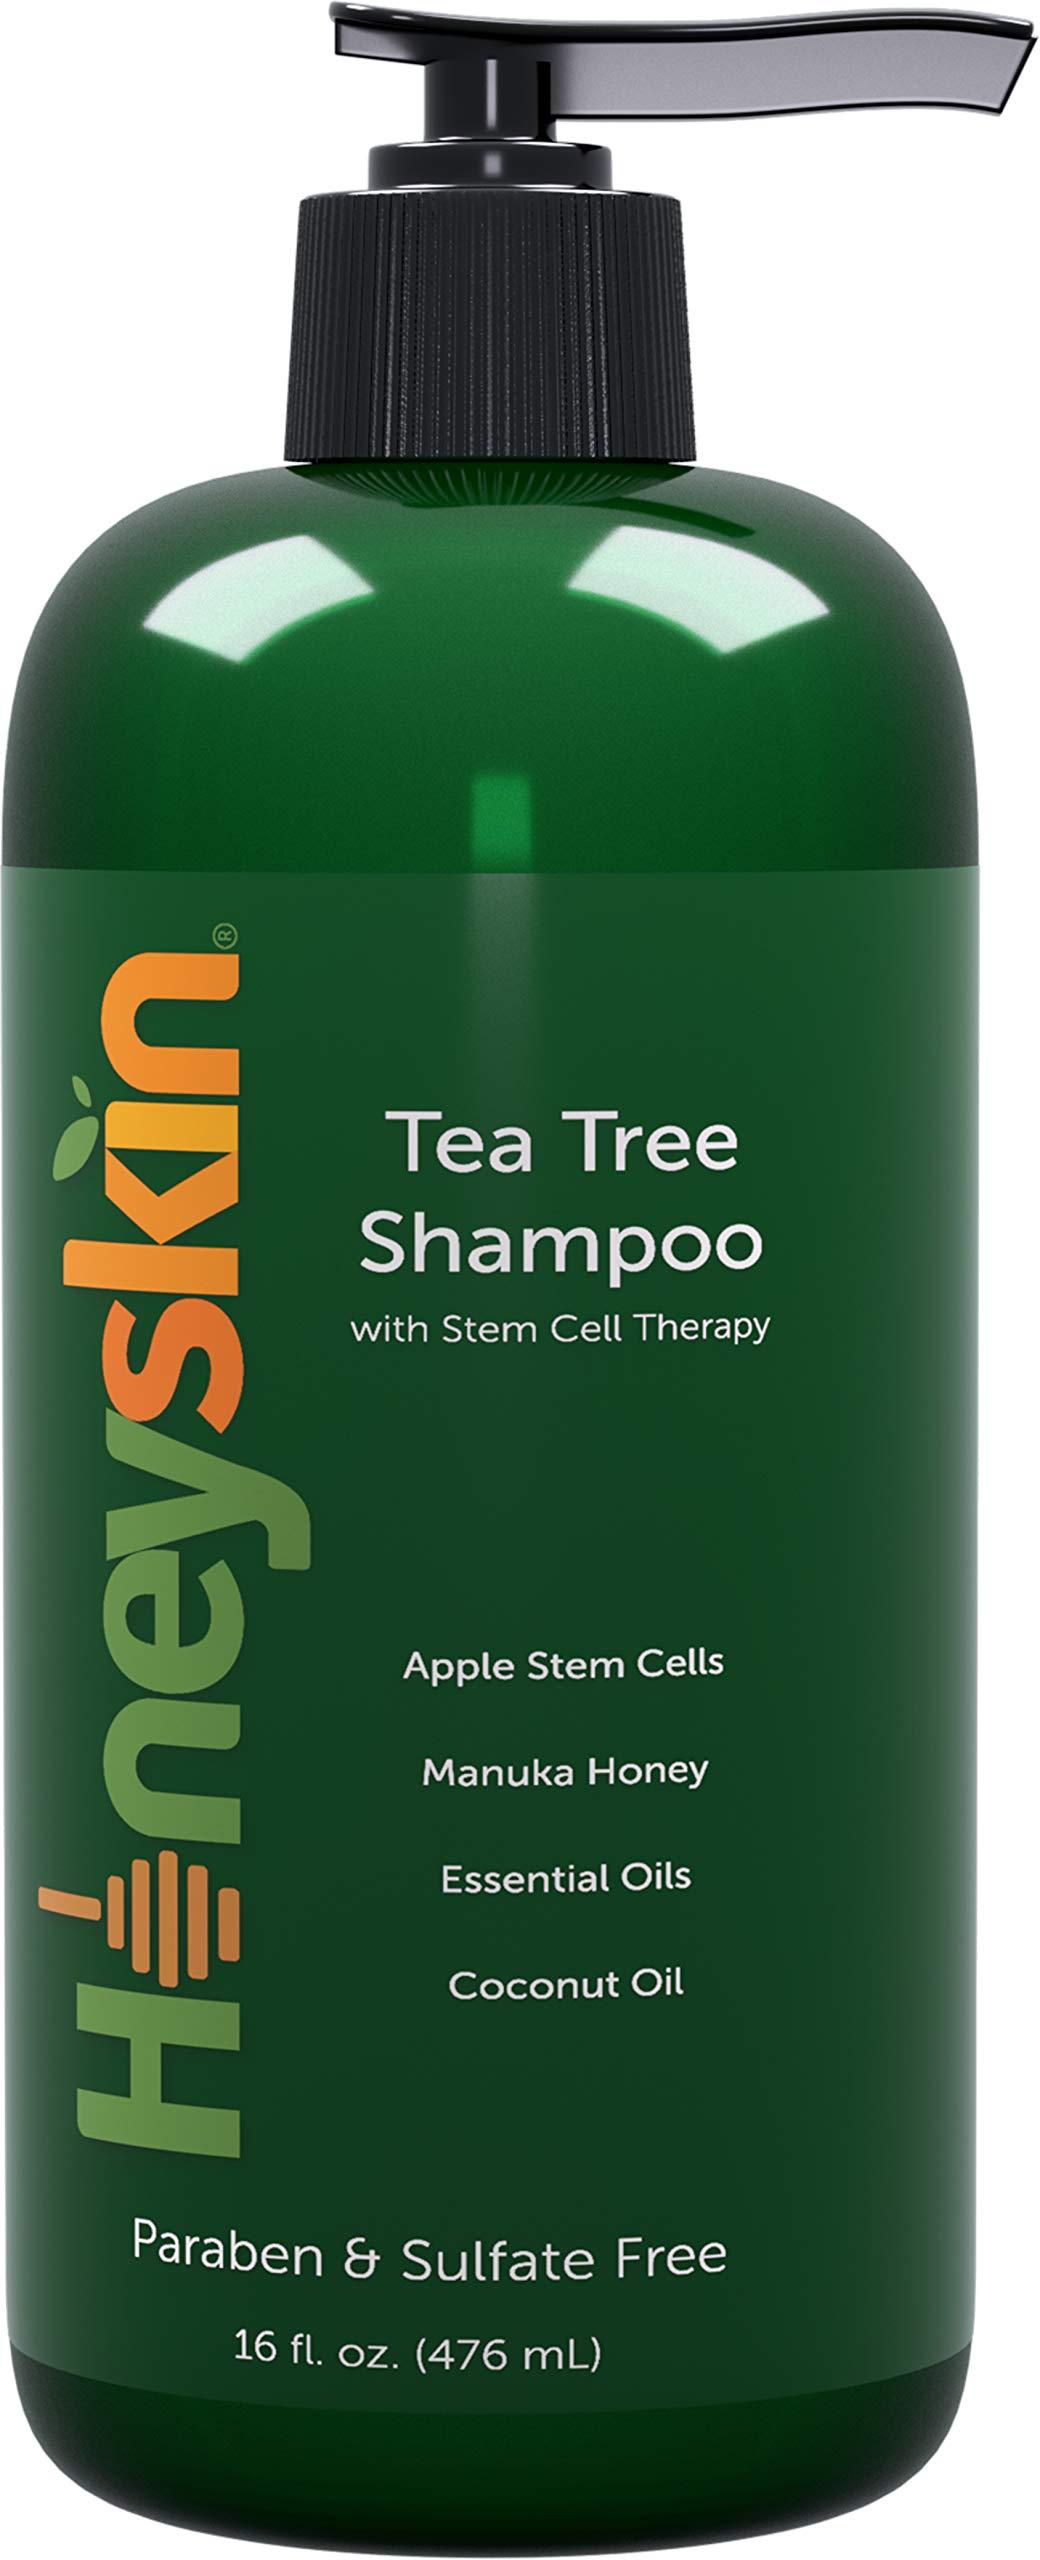 Organic Tea Tree Oil Shampoo - Hydrating Dandruff Hair Loss Itchy & Dry Damaged Scalp Treatment - Natural & Organic - Paraben and Sulfate Free - Manuka Honey, Coconut Oil and Stem Cells - 16oz by Honeyskin Organics